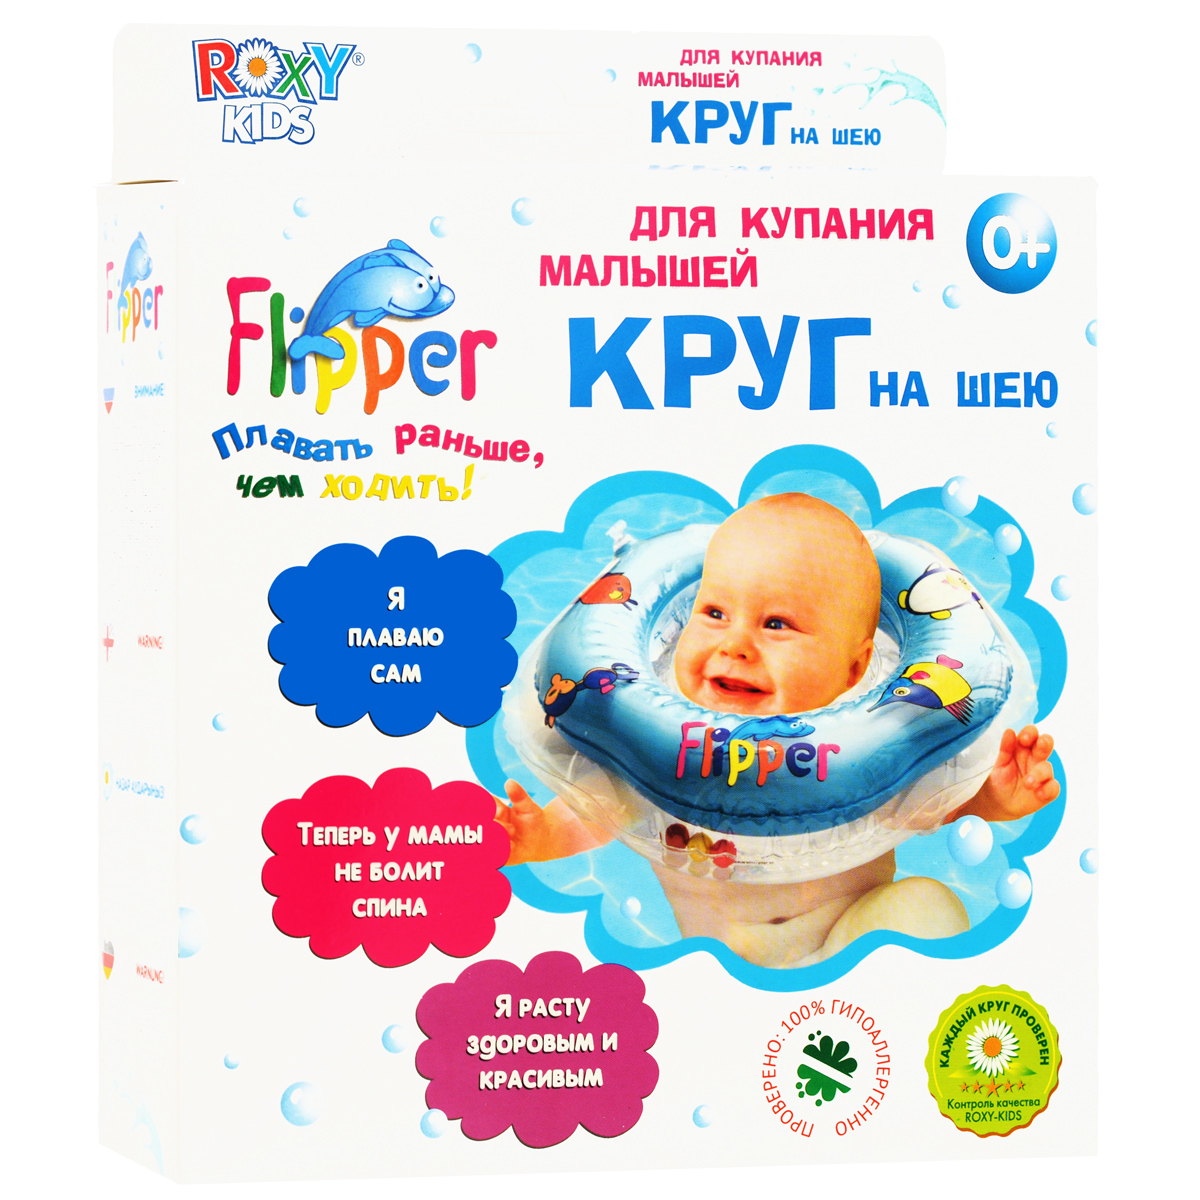 Круг на шею для купания Roxy-Kids  Flipper , цвет: зеленый - Все для купания